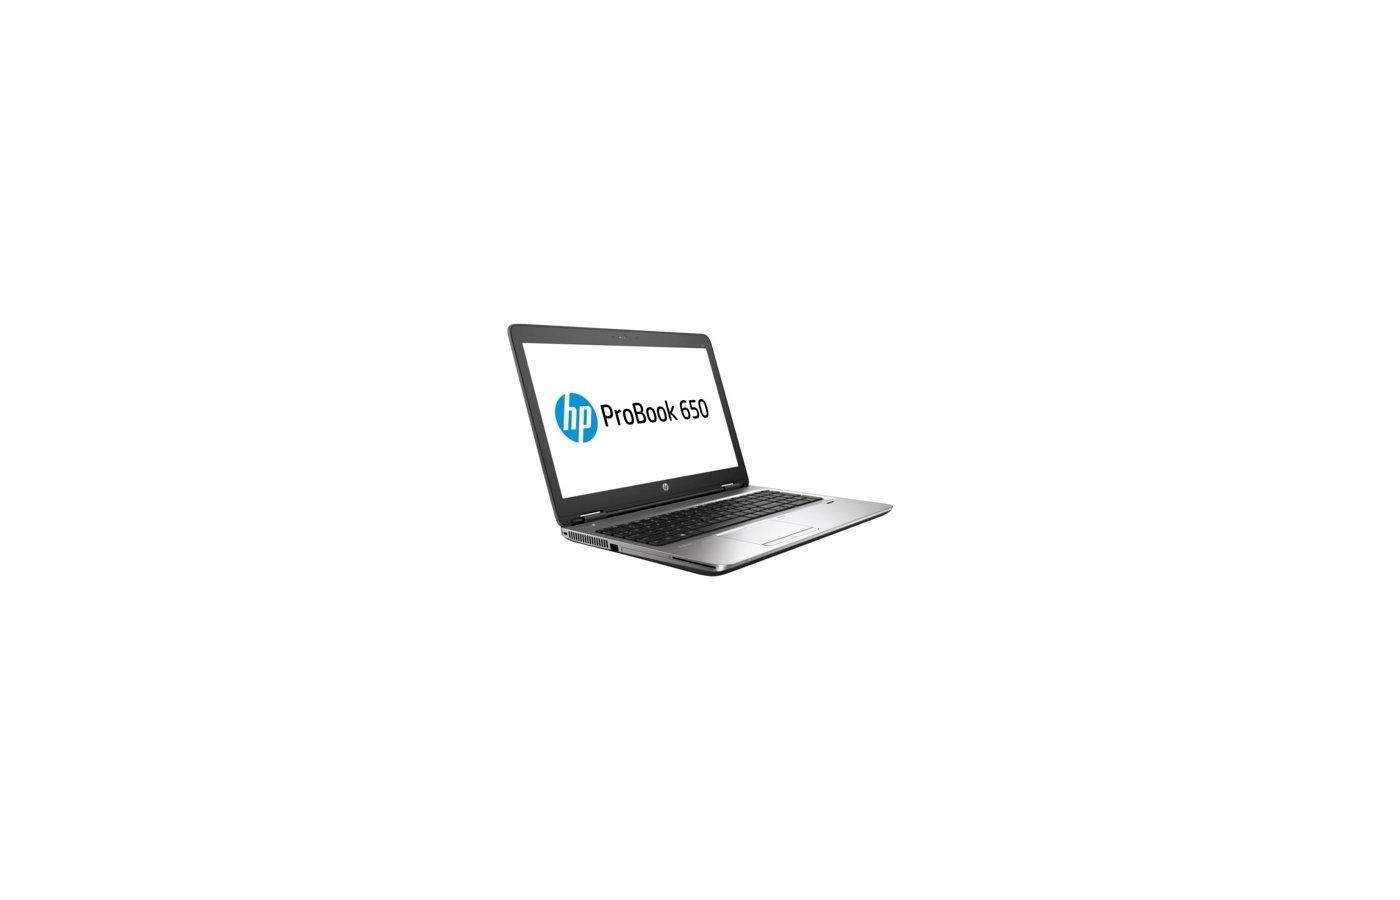 Ноутбук HP Probook 650 UMA /Y3B18EA/